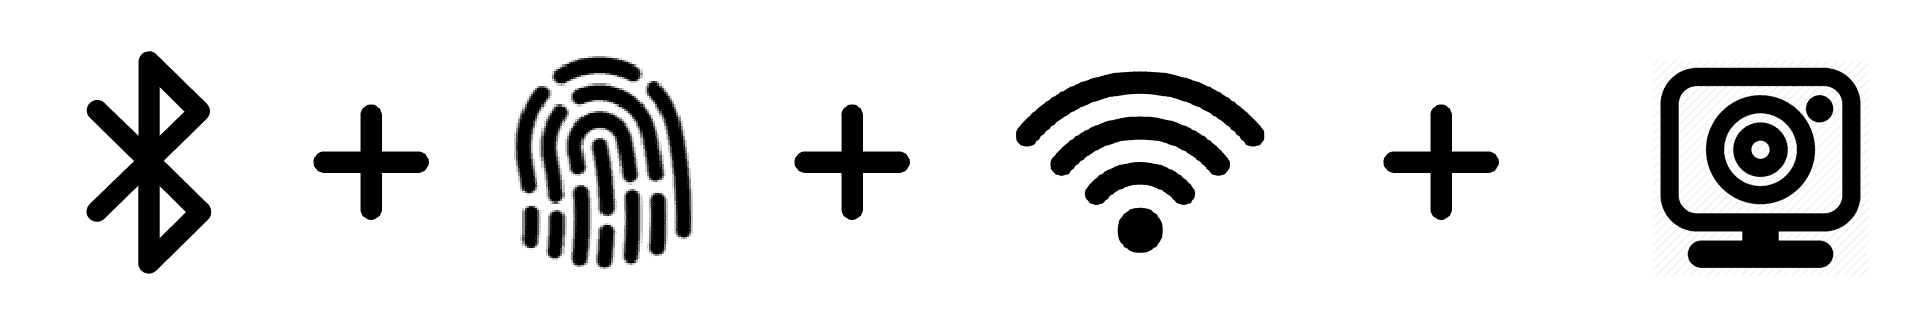 Bluetooth Fingerprint WiFi Camera Door access